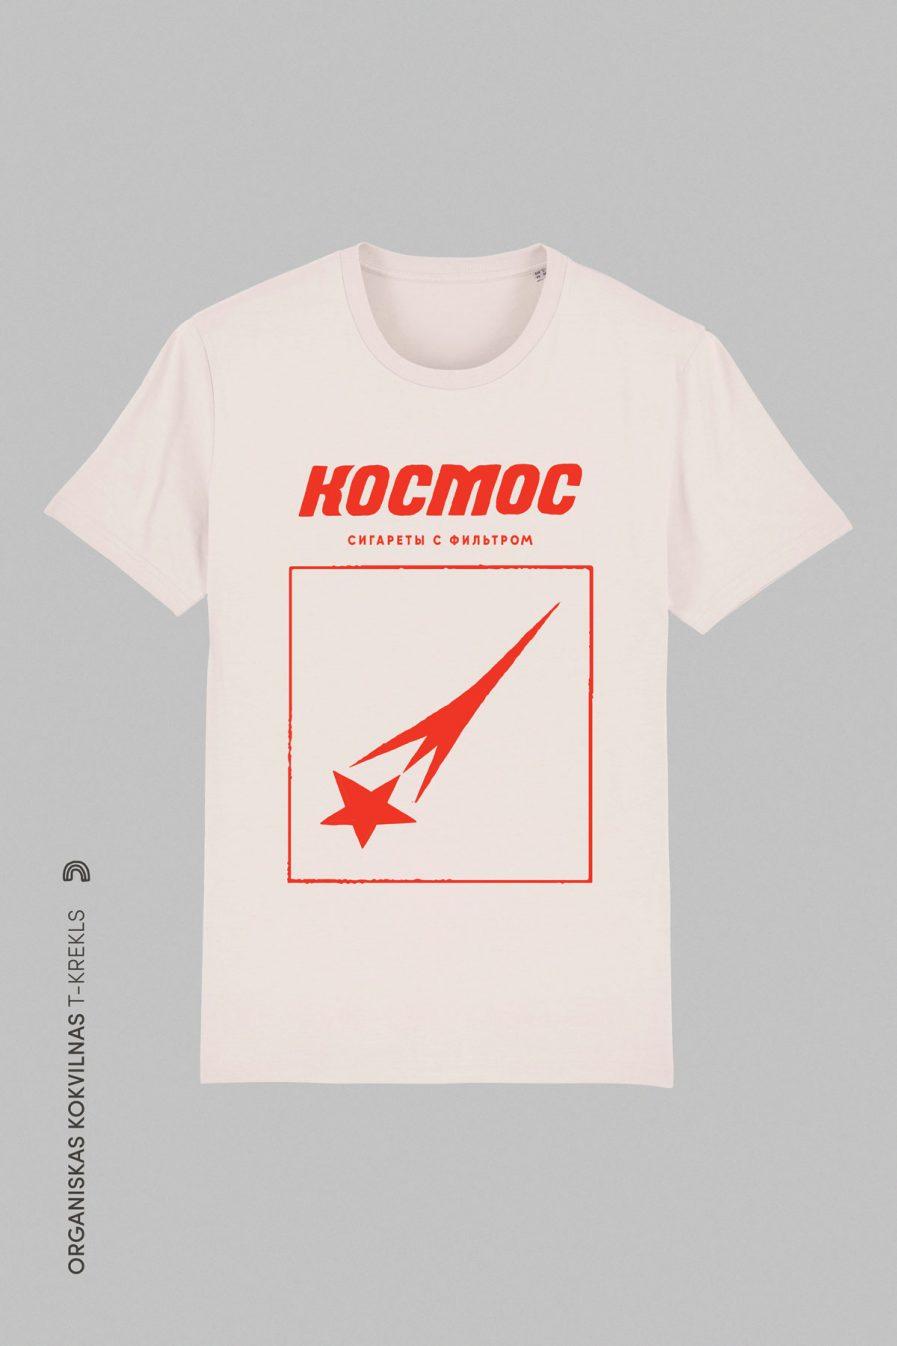 Kocmoc Organic Cotton T-shirt